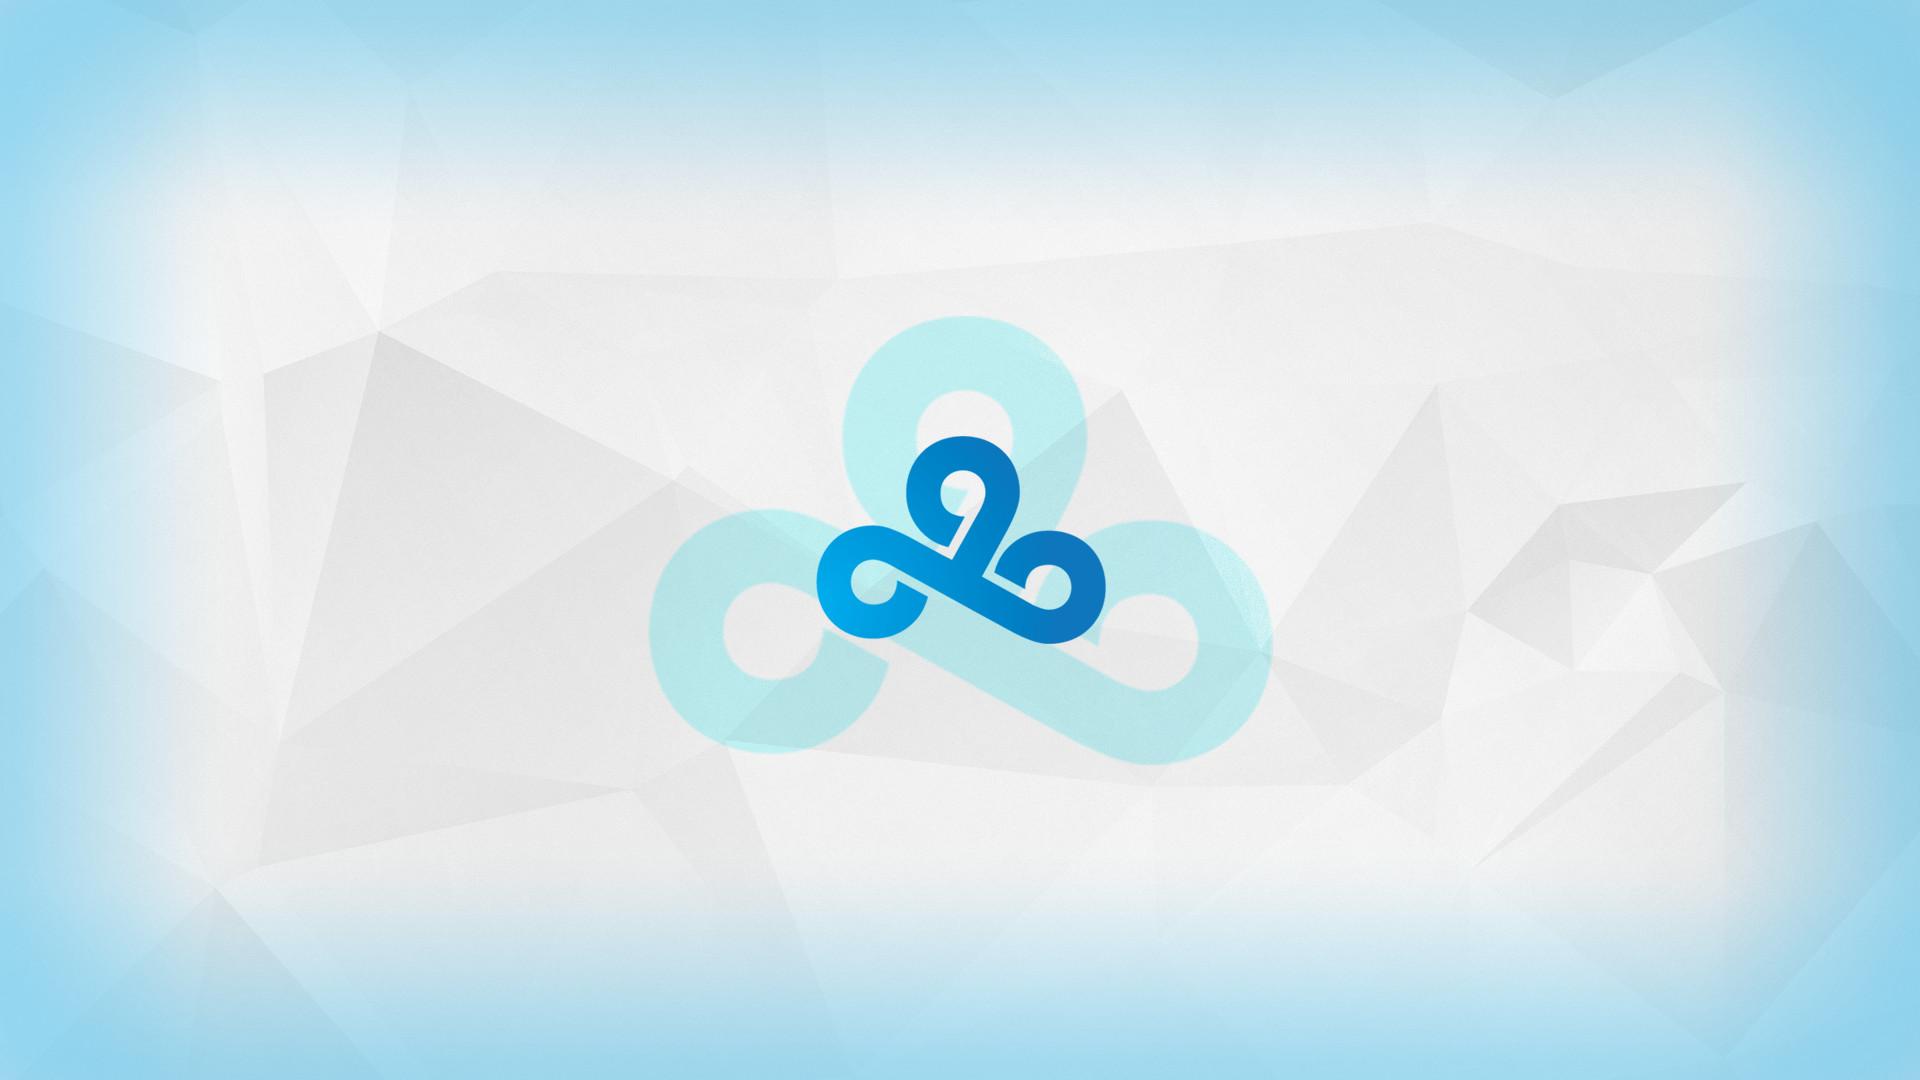 Dota 2I found a cool wallpaper featuring Cloud 9's DOTA2 team …